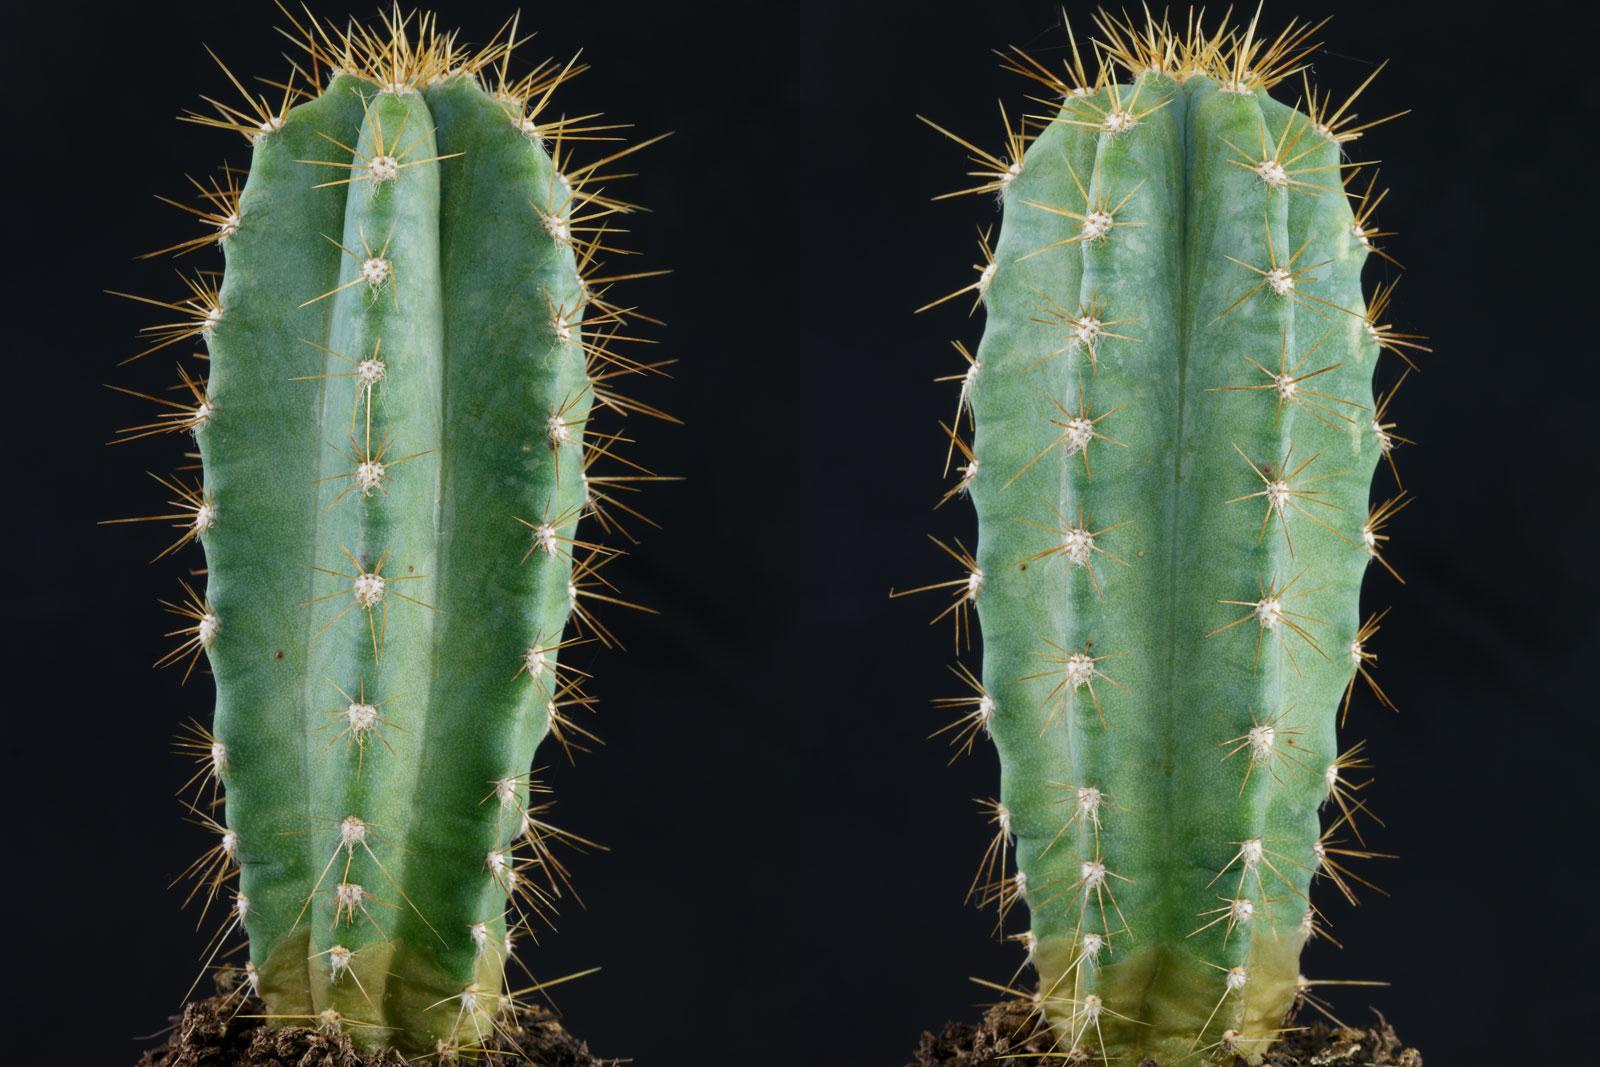 Pilosocereus pachycladus